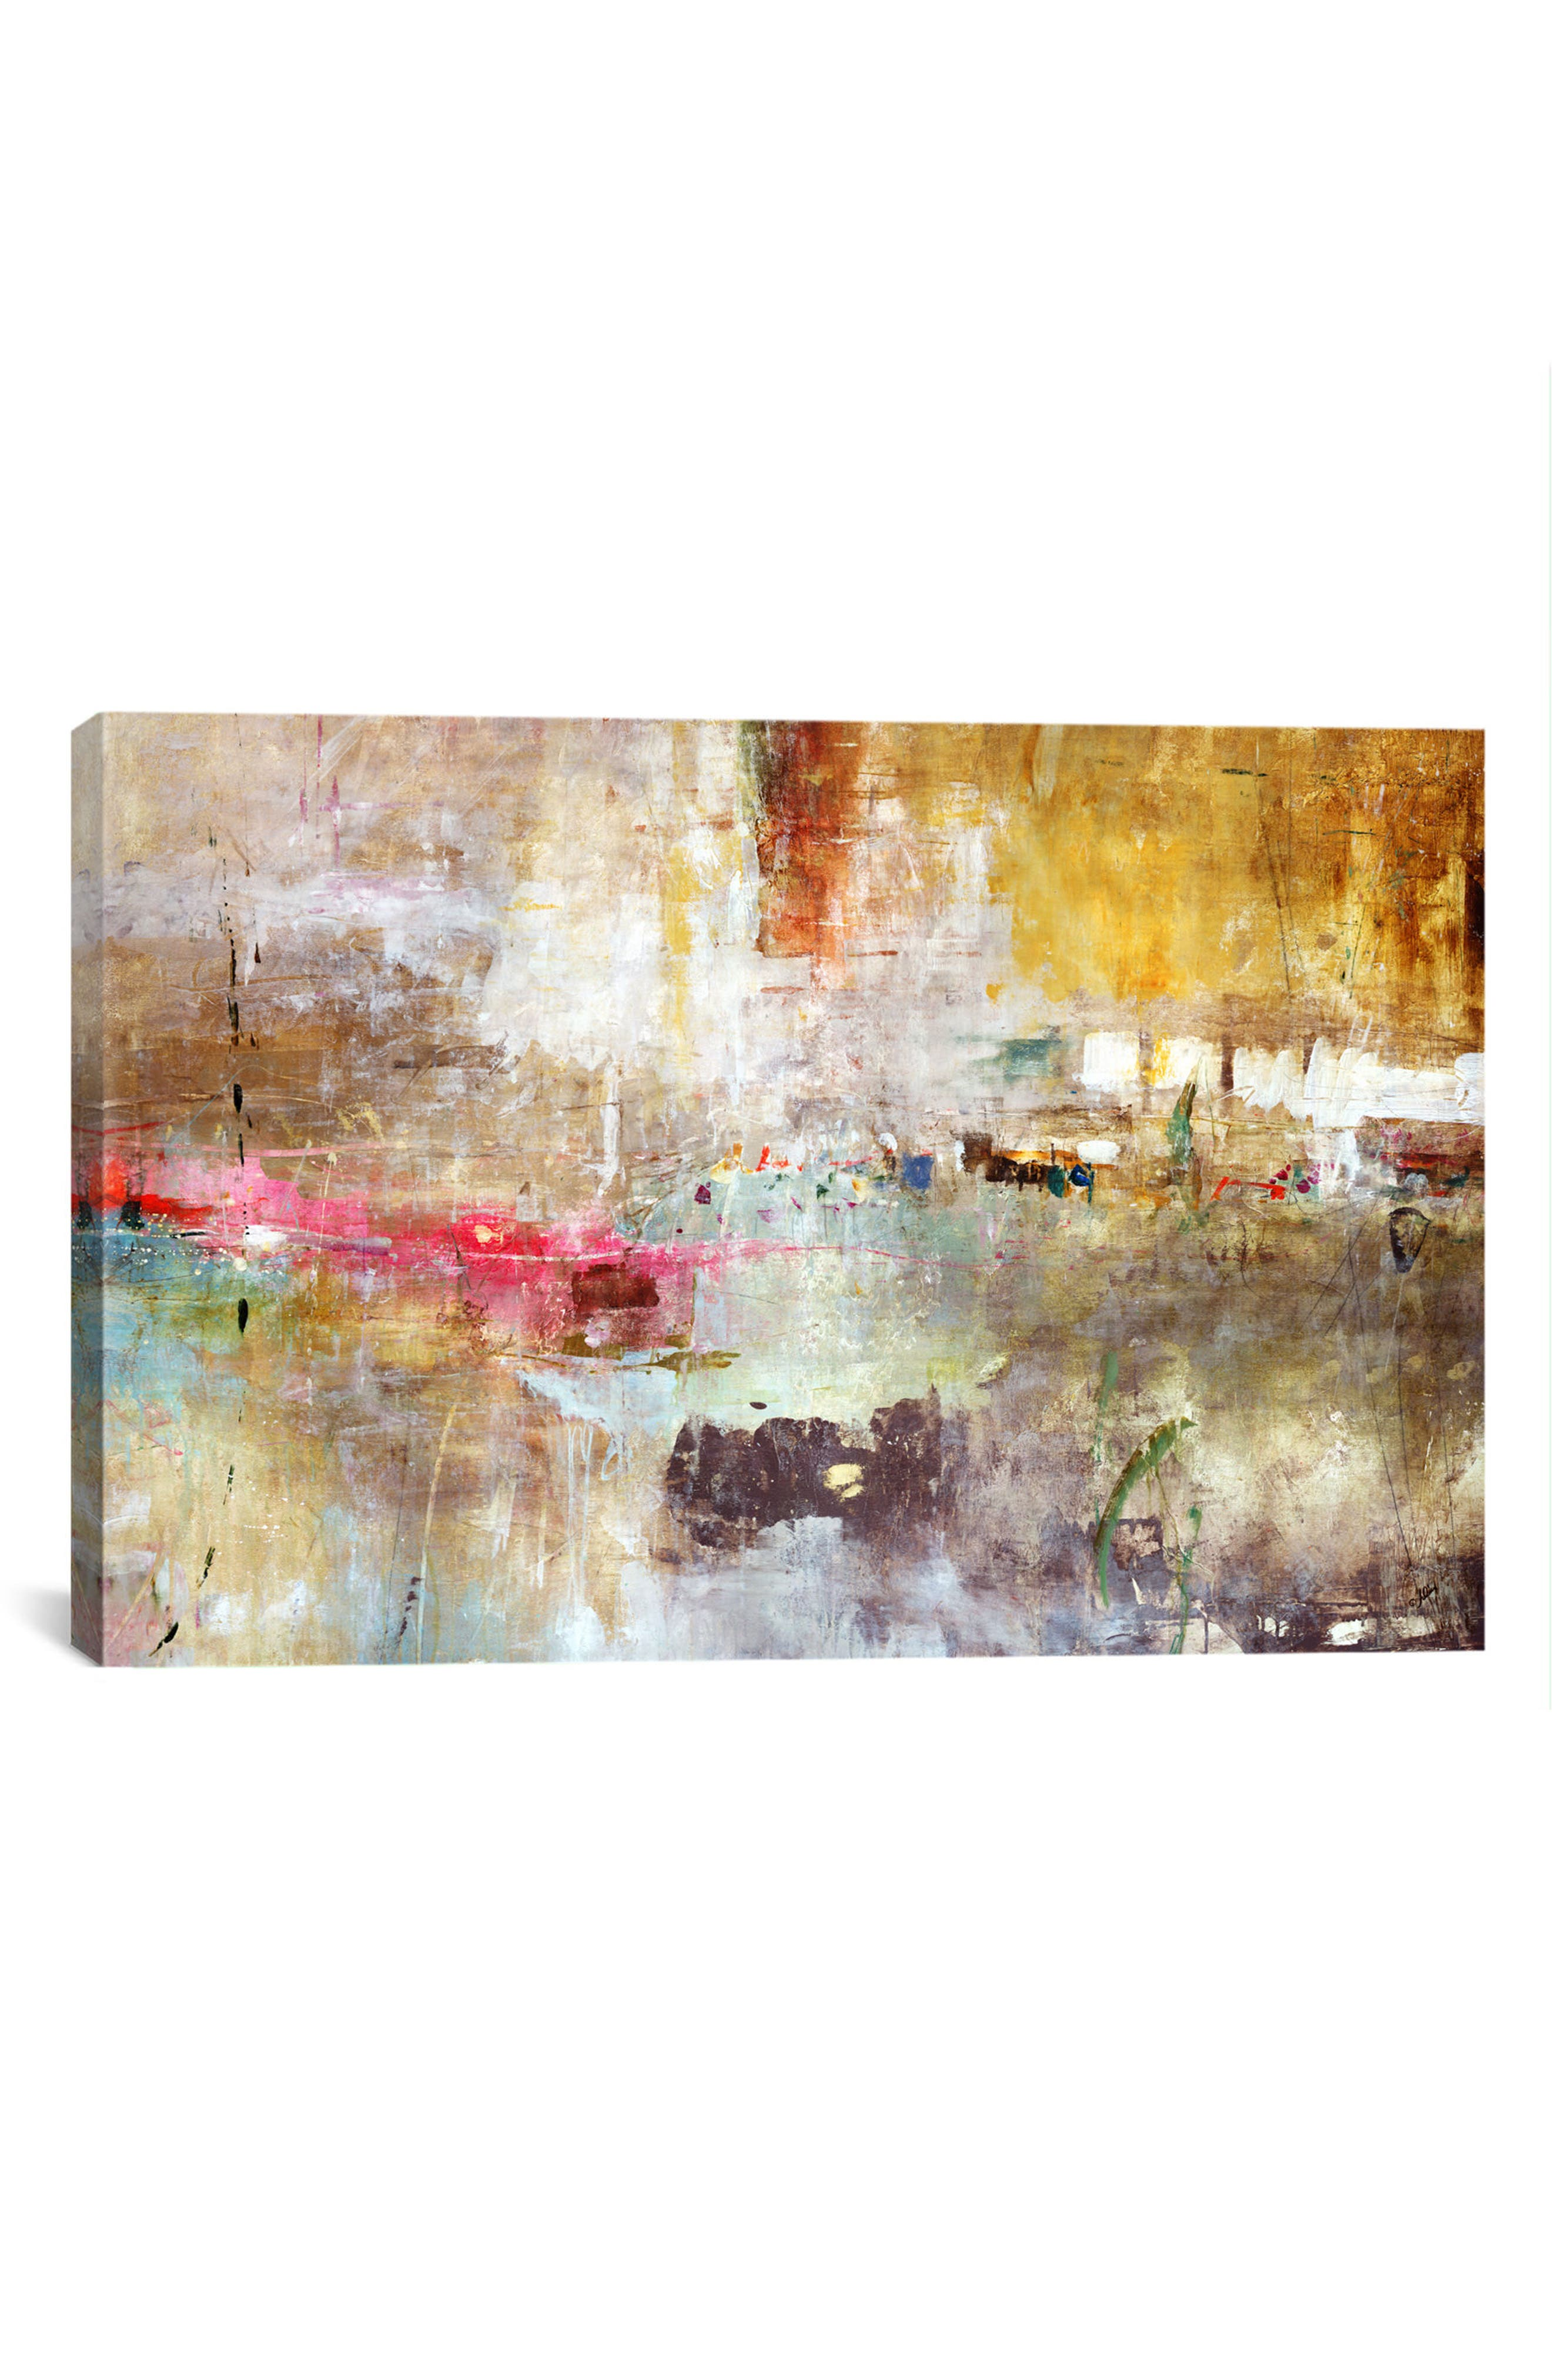 'Rain Clouds - Julian Spencer' Giclée Print Canvas Art,                             Main thumbnail 1, color,                             BEIGE